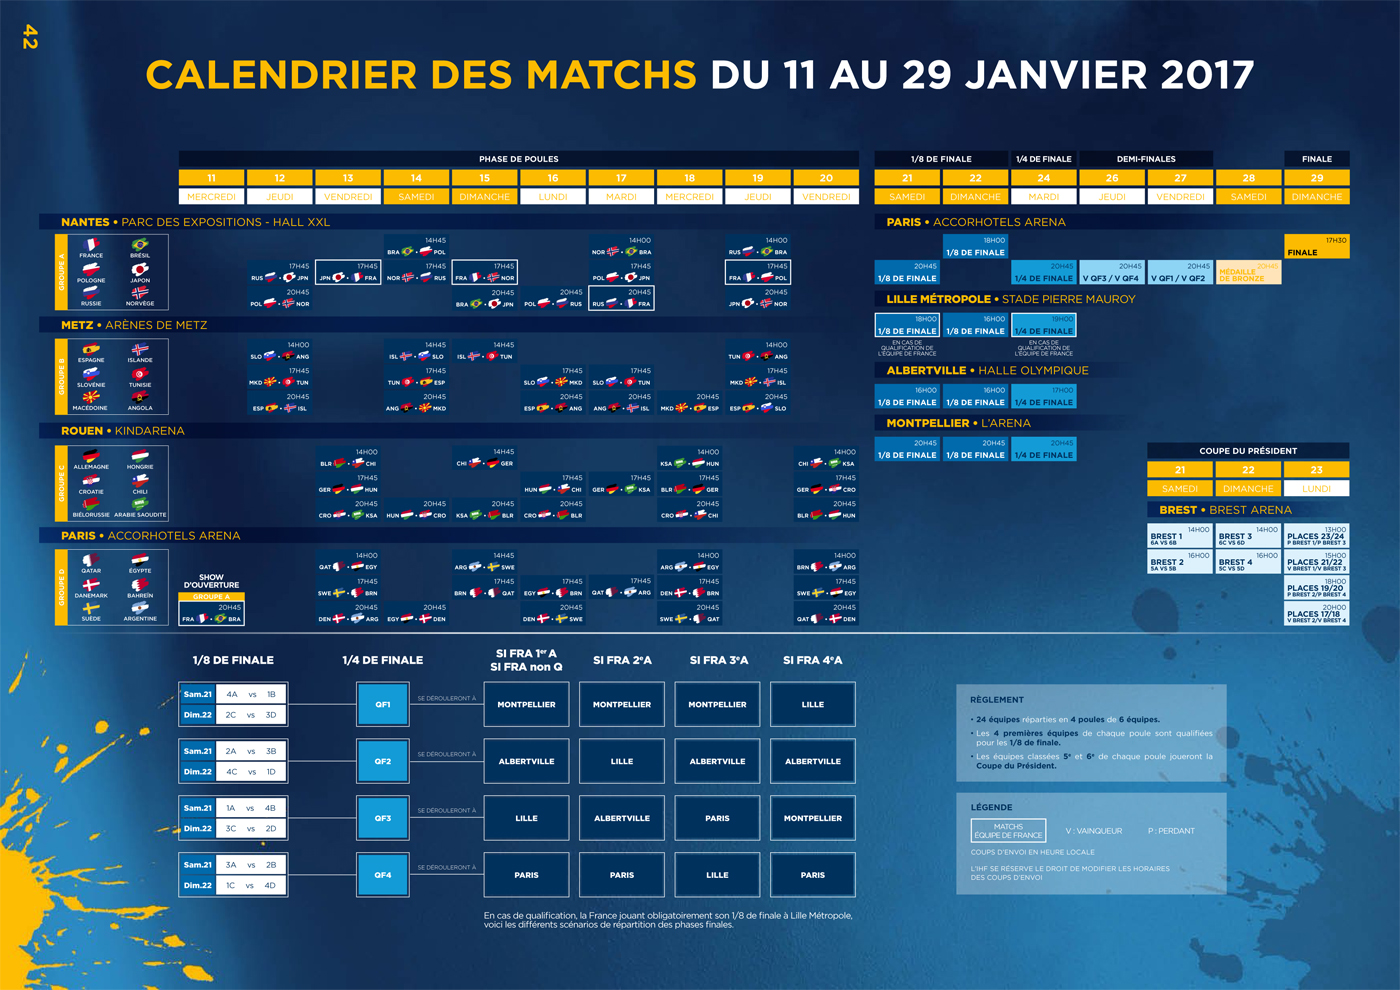 Handball Calendrier.Tv Calendrier Et Horaires De Diffusion Des Matchs Du